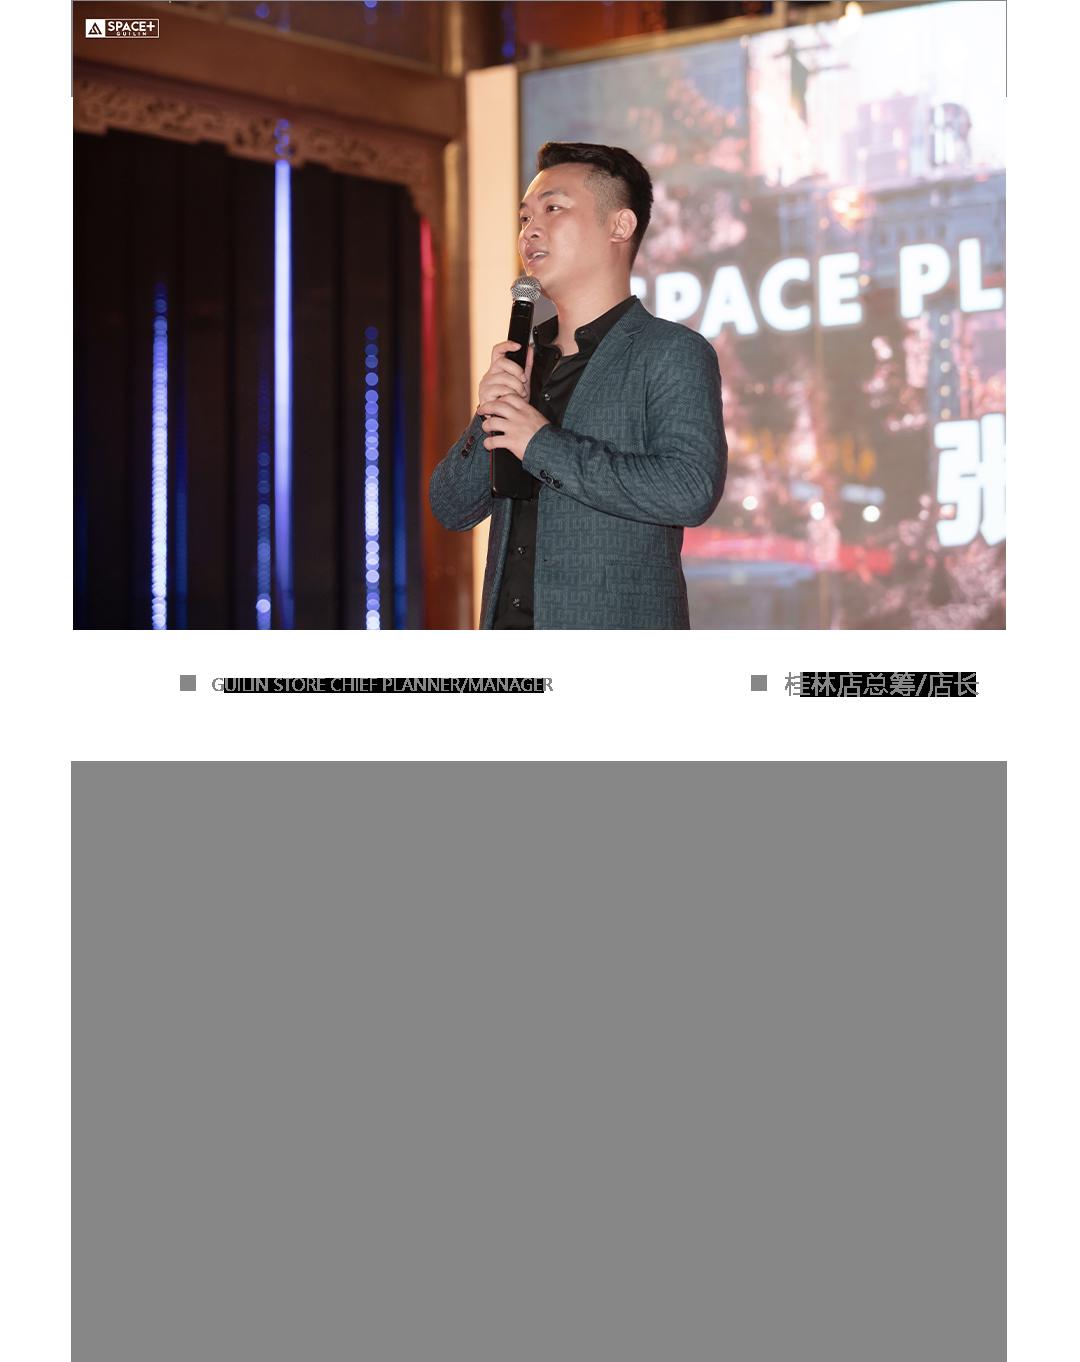 SPACE+GUILIN丨06.19 开业盛典,开创娱乐新地标